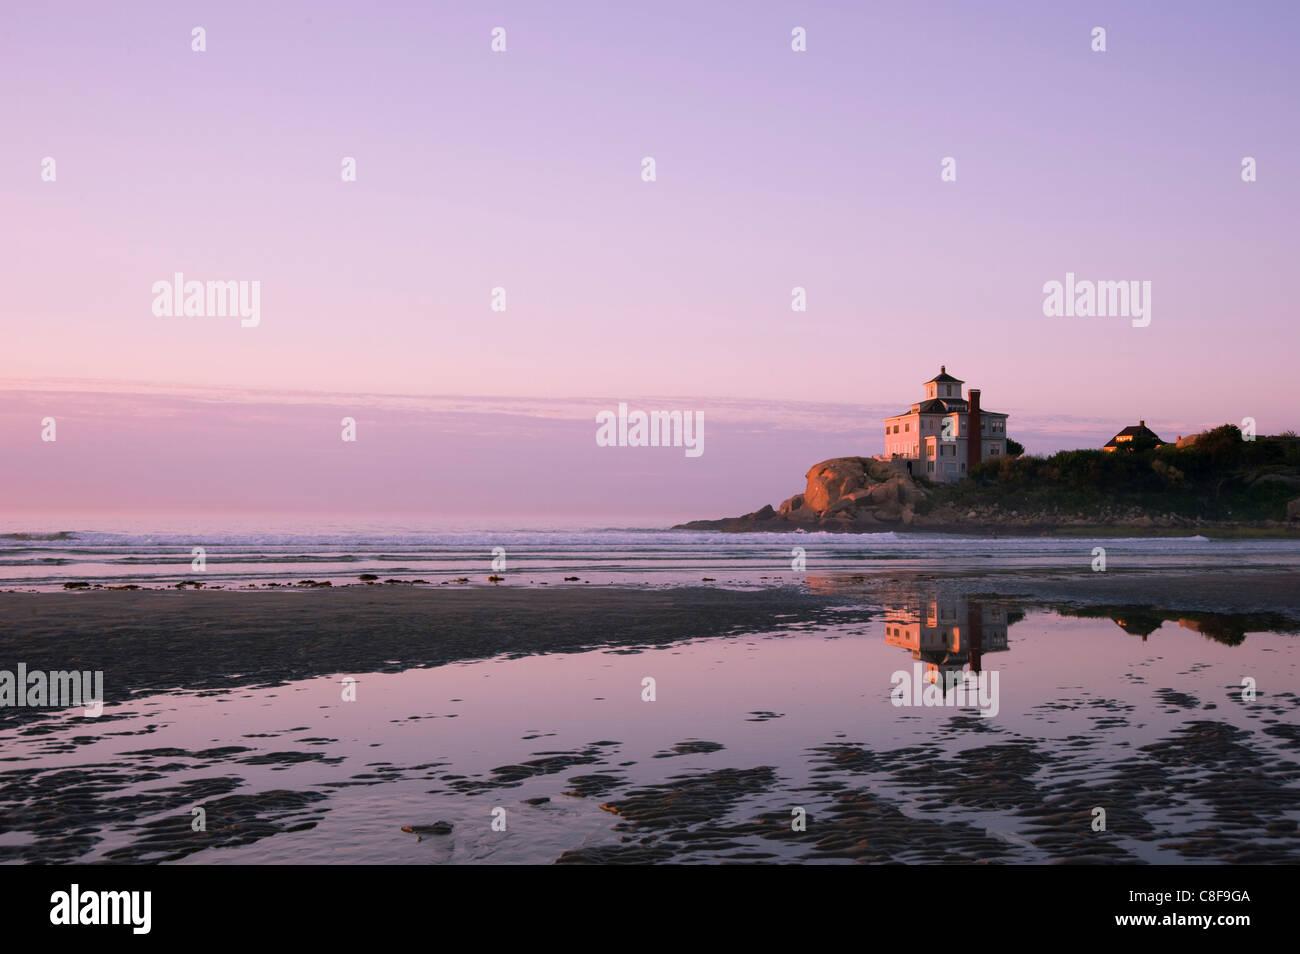 Sunrise at Good Harbor Beach, Gloucester, Massachussetts, New England, United States of America - Stock Image